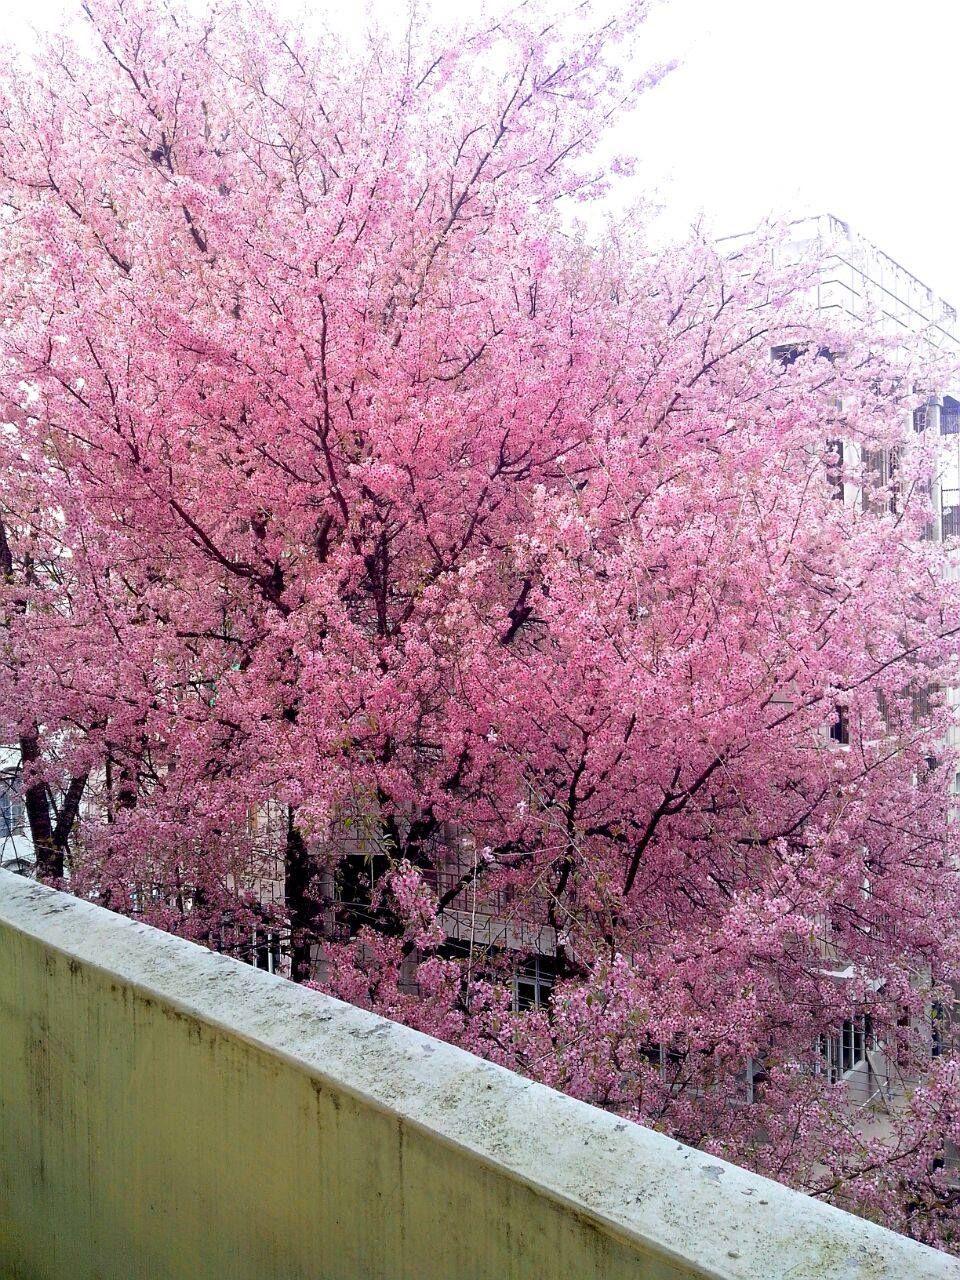 Shillong Indian Cherry Blossom Festival Held In November Cherry Blossom Festival Pink Aesthetic People Art